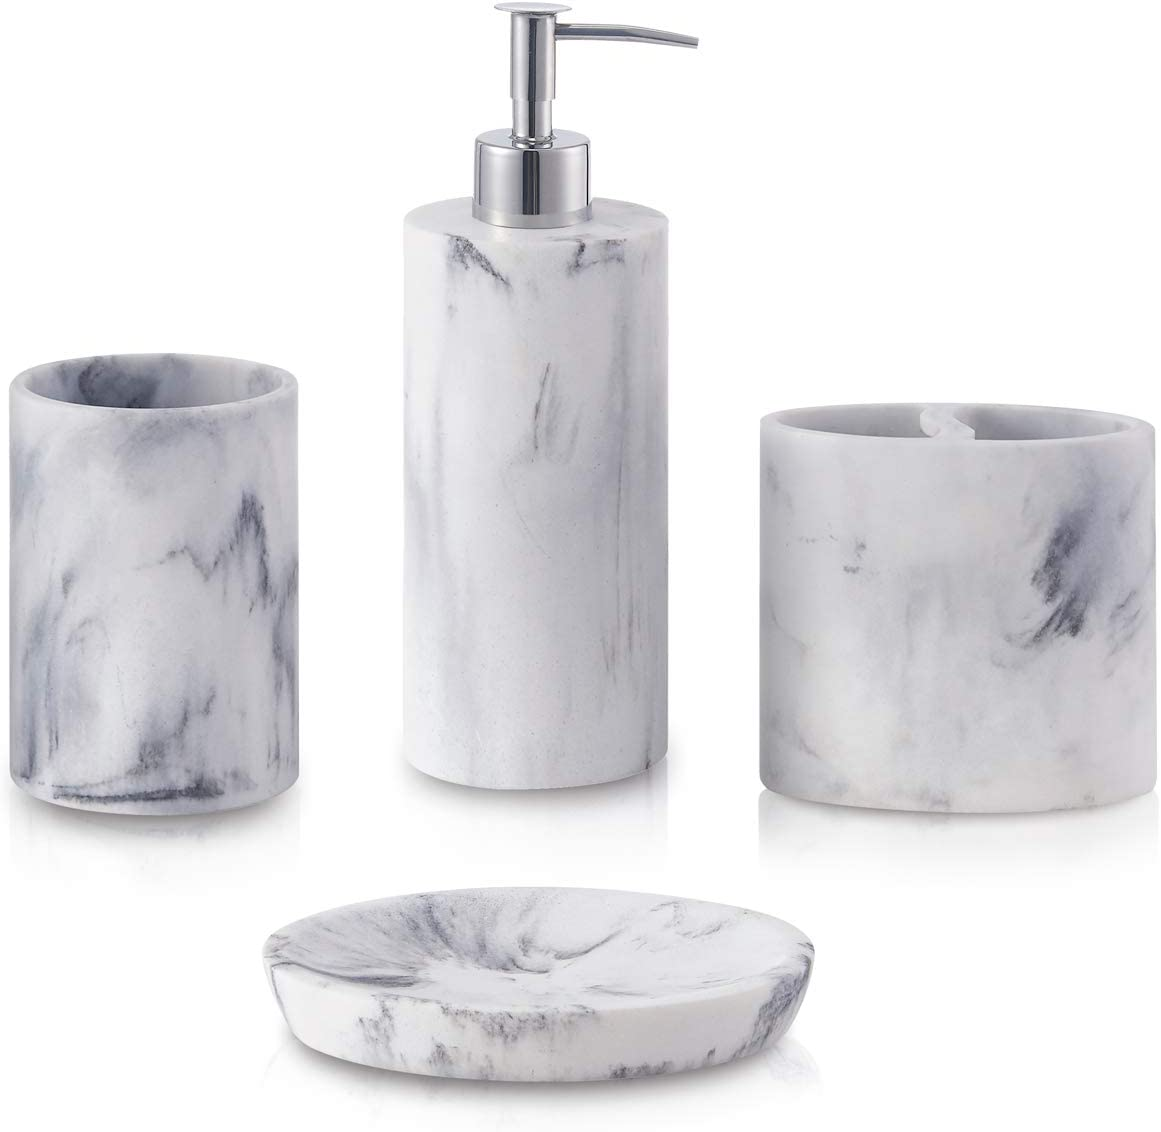 Amazon Com Zccz Bathroom Accessory Set 4 Pcs Marble Look Bathroom Vanity Countertop Accessory Set Bathroom Décor Accessories With Soap Dispenser Toothbrush Holder Bathroom Tumbler Soap Dish Home Kitchen